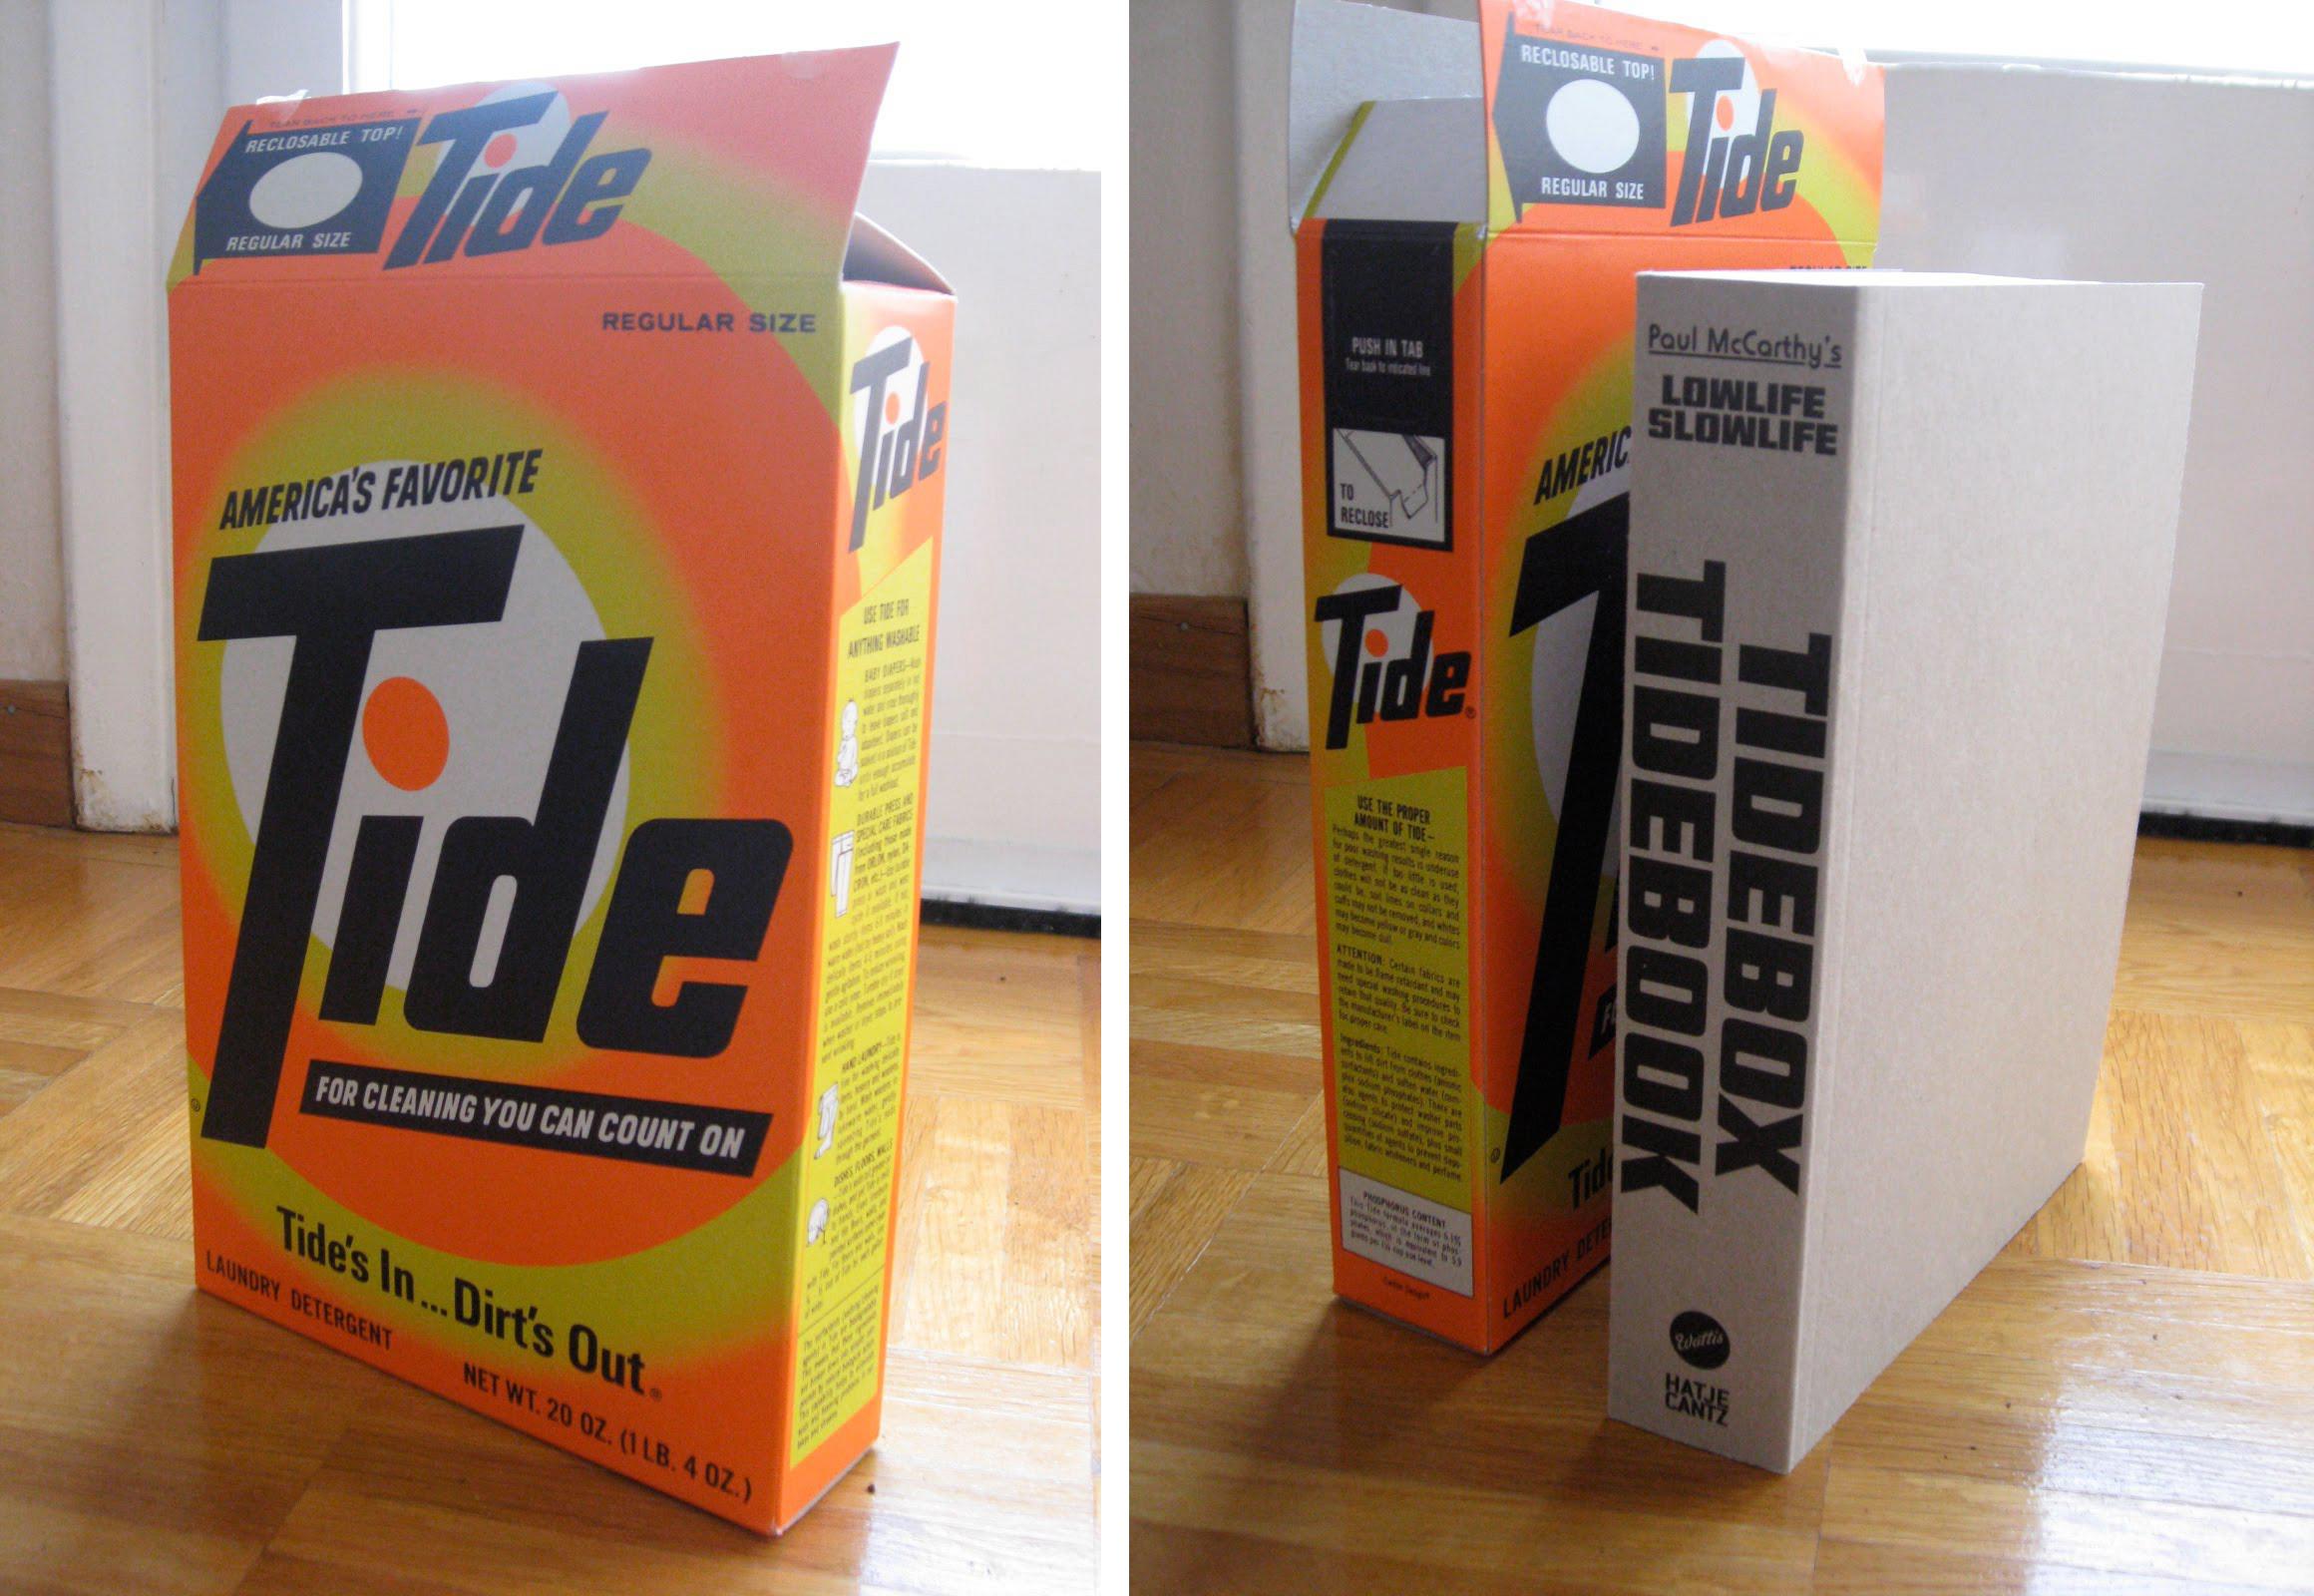 TideBox